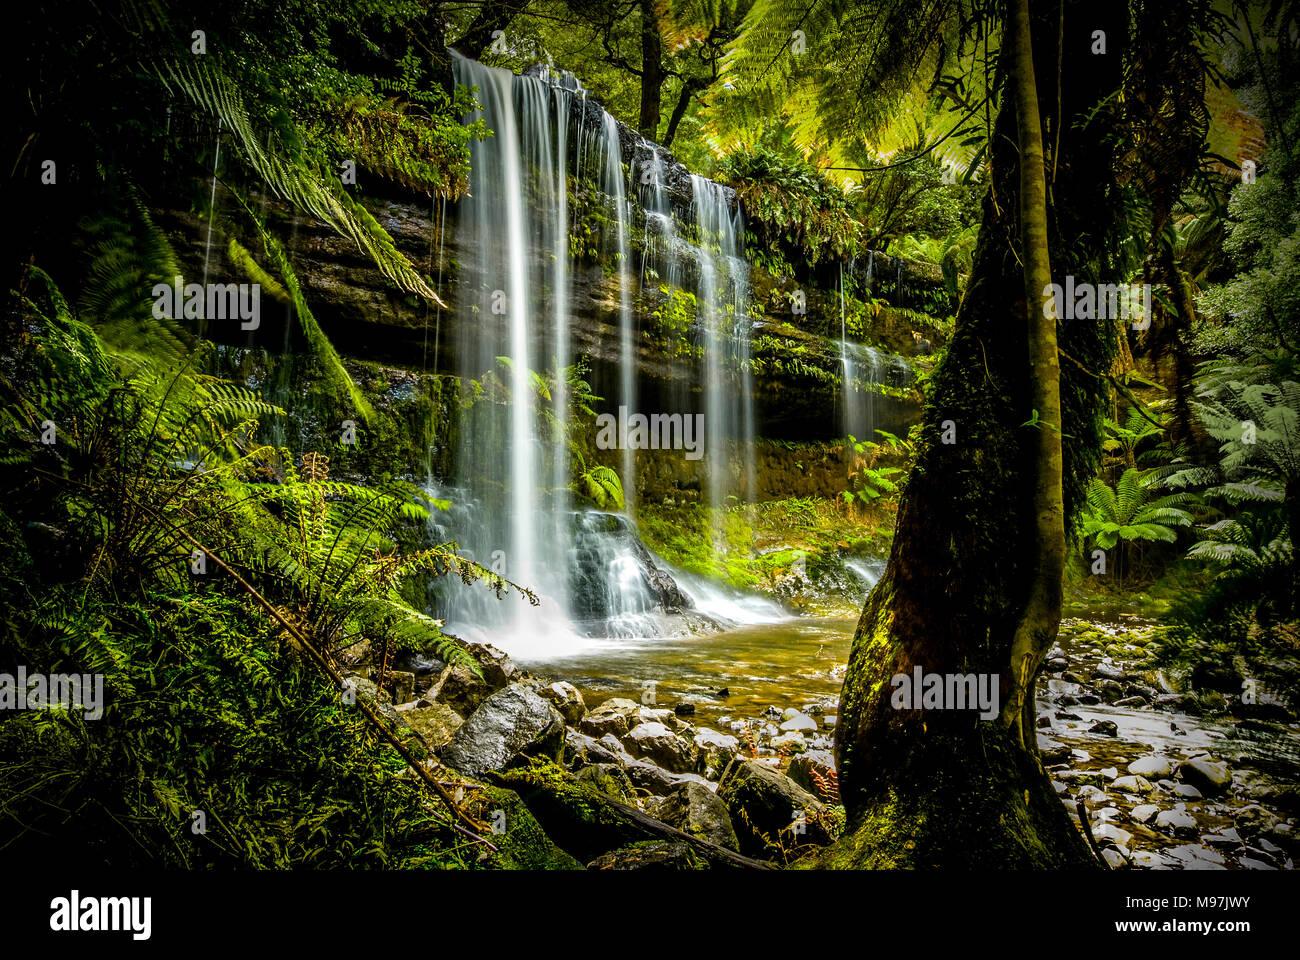 Australien, Tasmanien, Urwald, Wasserfall, Wasser, Russell Falls, Mount Field National Park - Stock Image